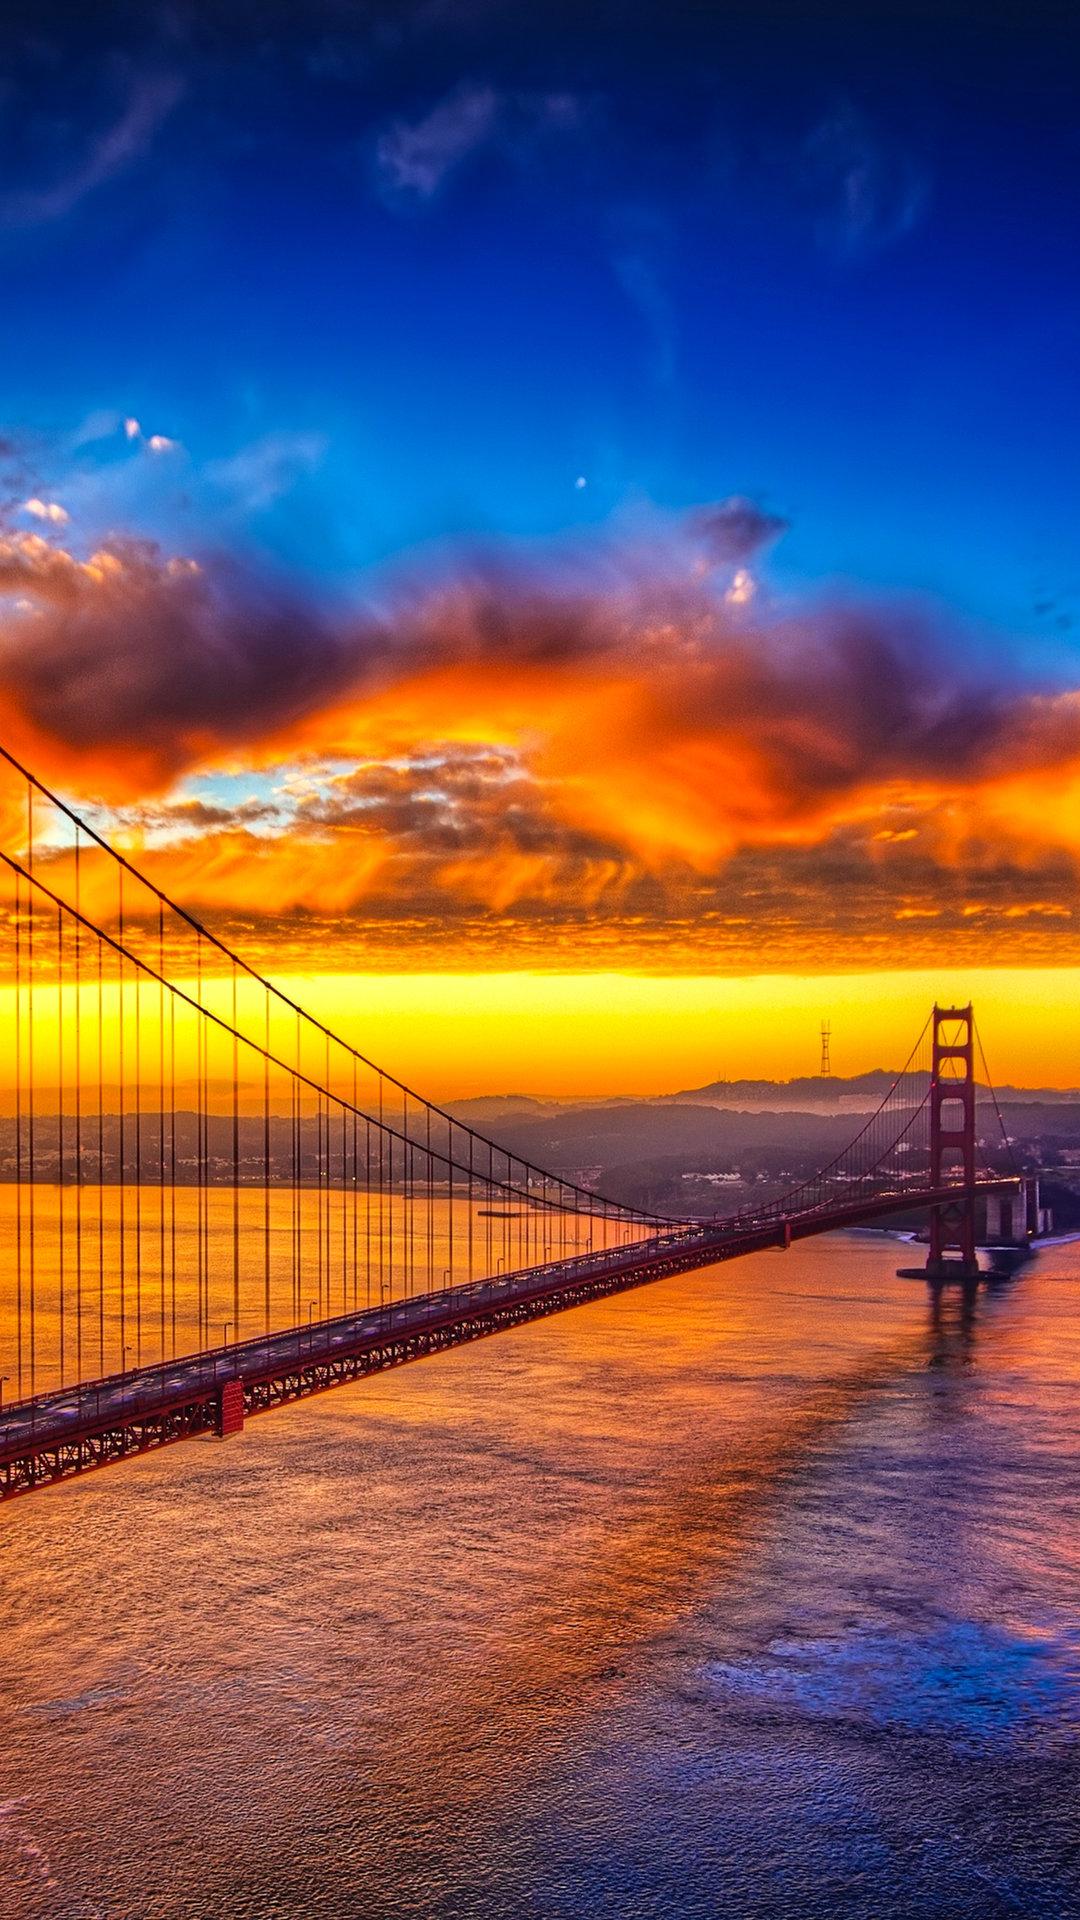 Golden Gate Bridge At Sunset Iphone Wallpaper